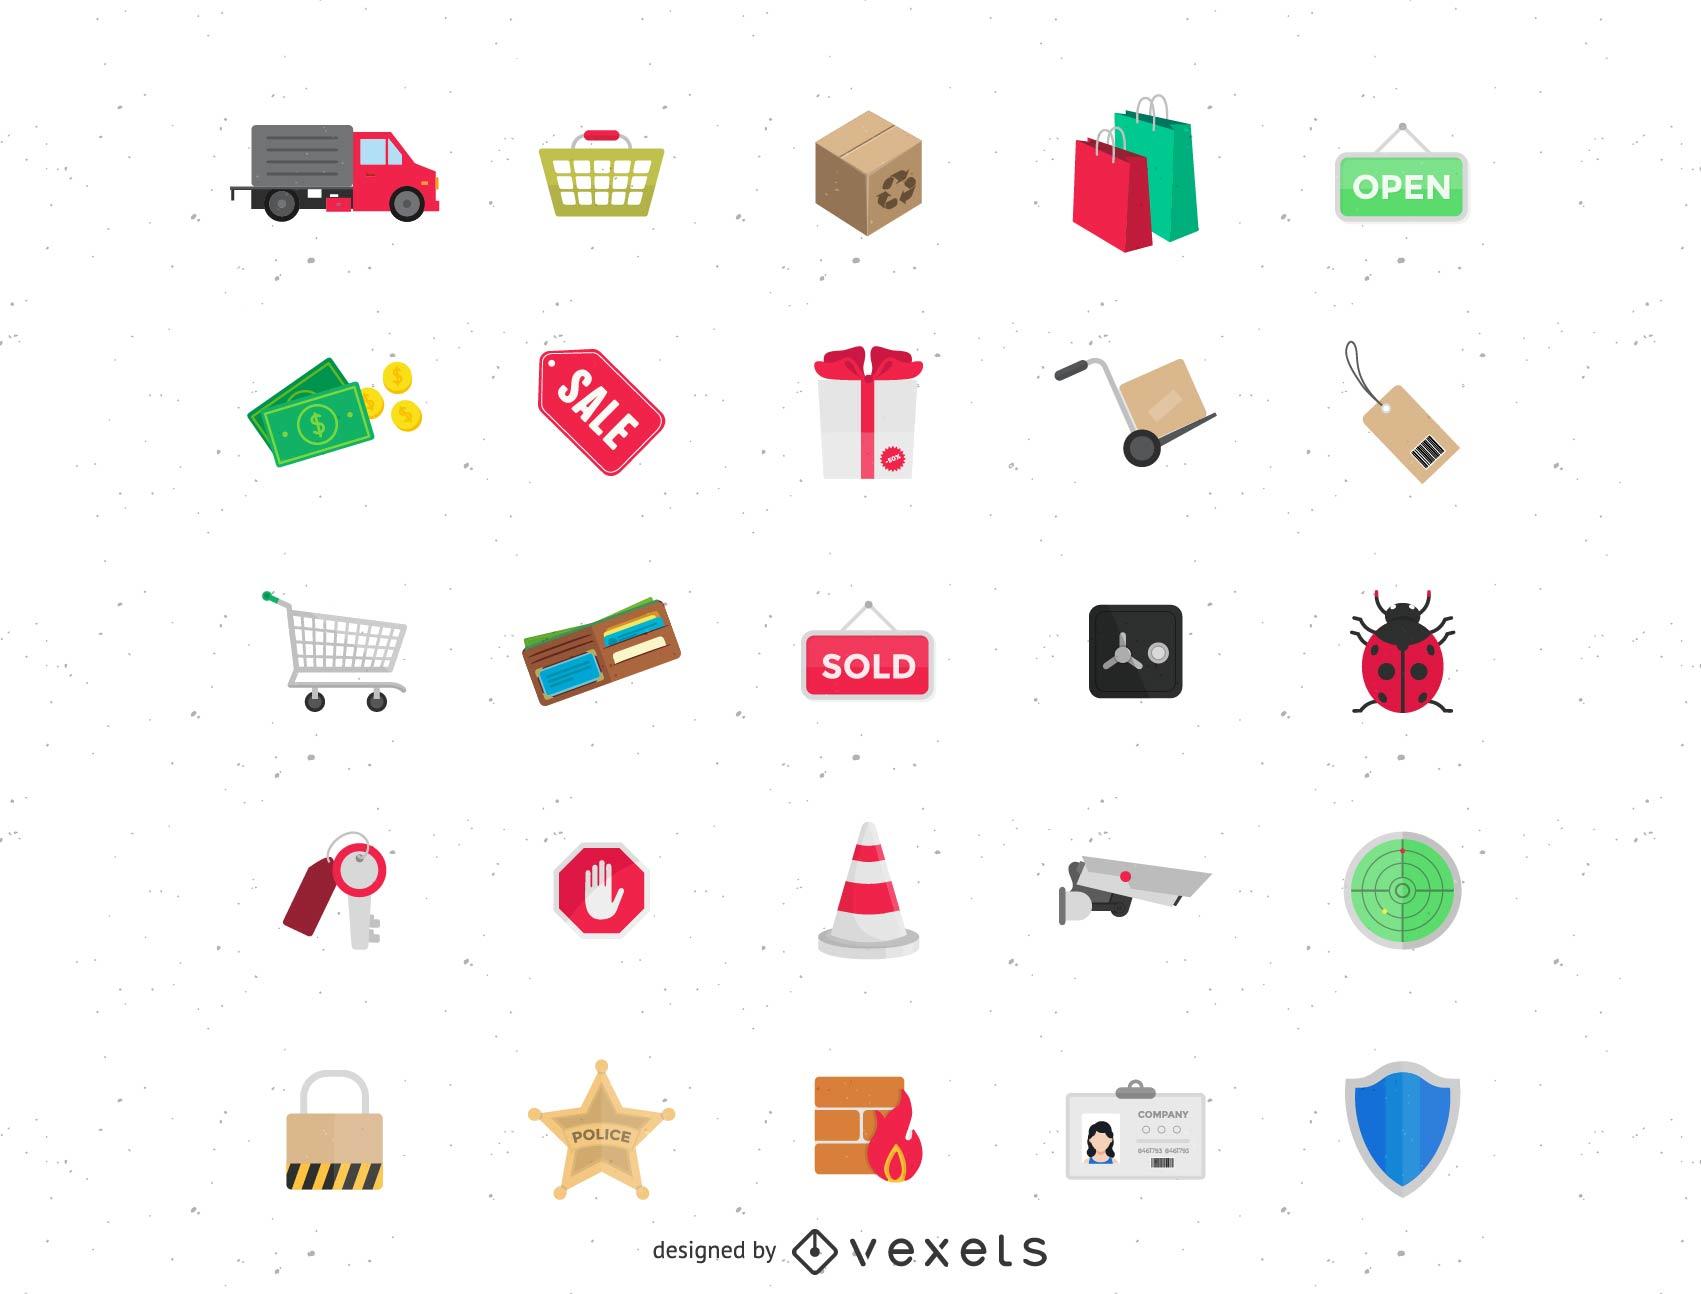 supermercado con vector icono